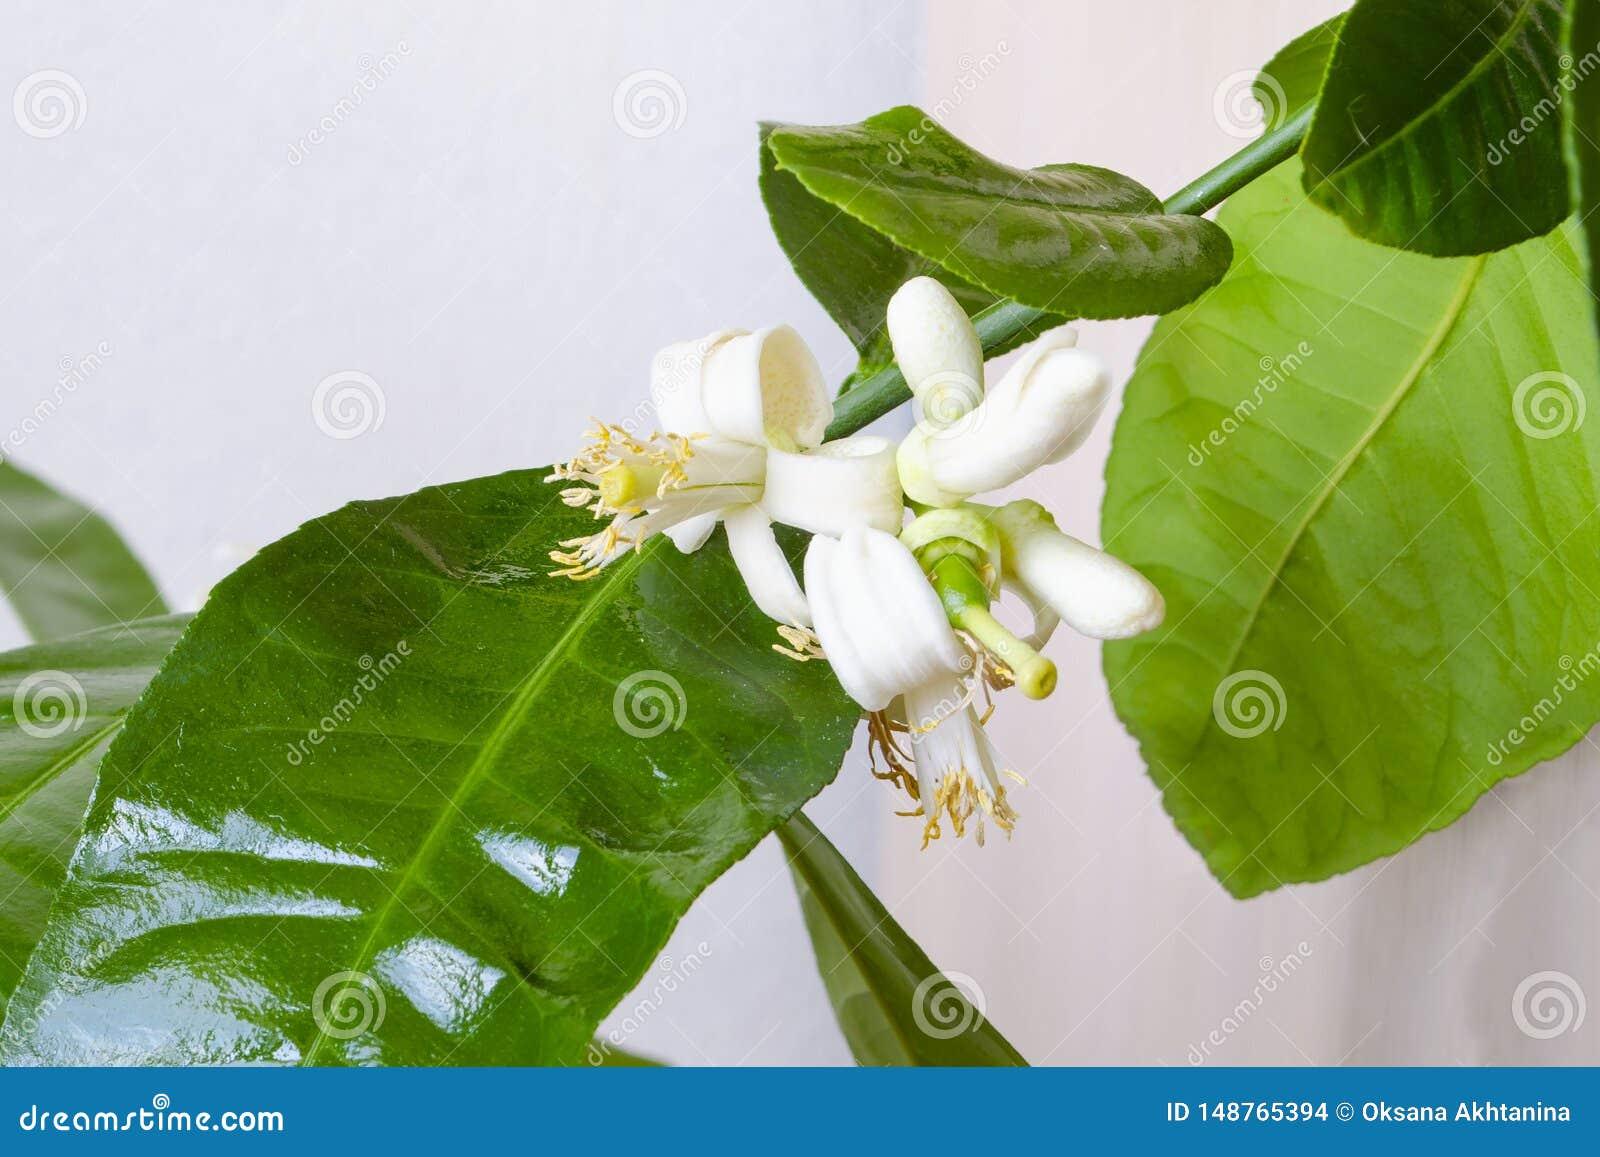 Blooming lemon tree, citrus tree flowers. White flowers with yellow stamens on a lemon tree, lime citrus tangerine. Citrus Blossom